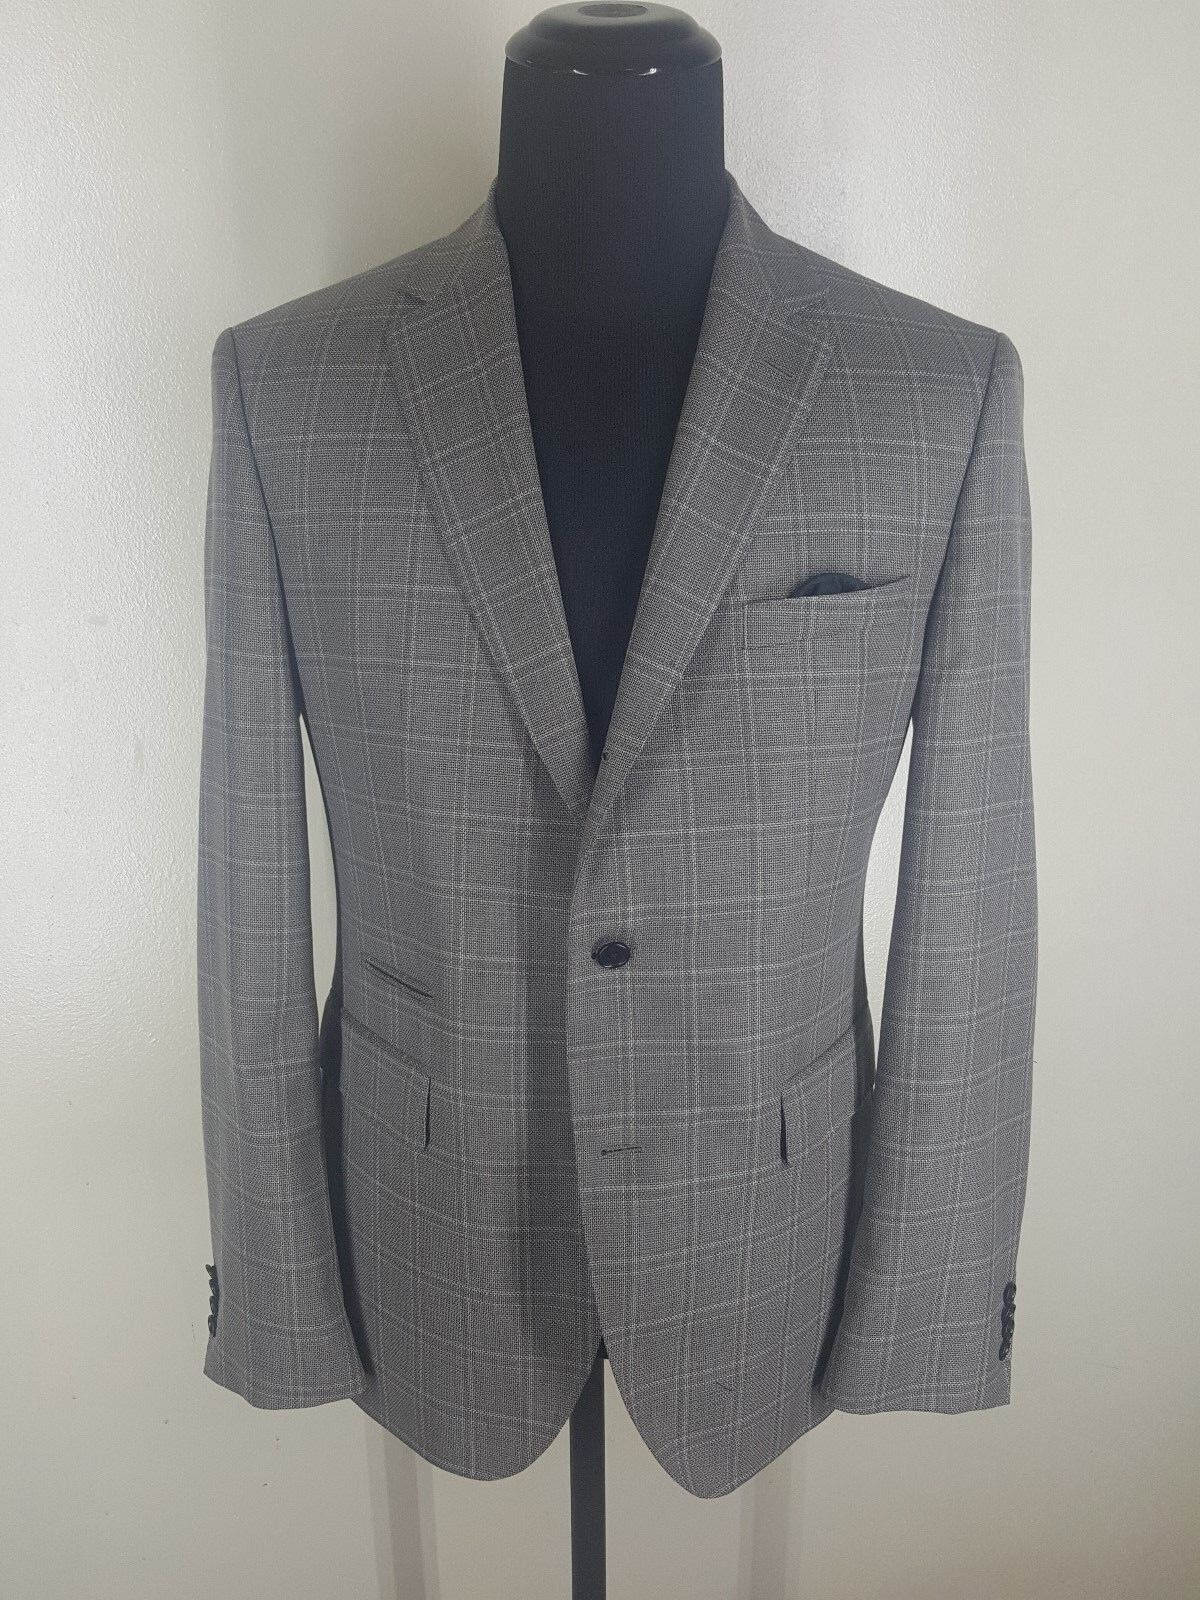 HUGO BOSS Plaid Sport Coat  3 Btn Side Vents Super 130's Wool    Fit 42 -44 Reg